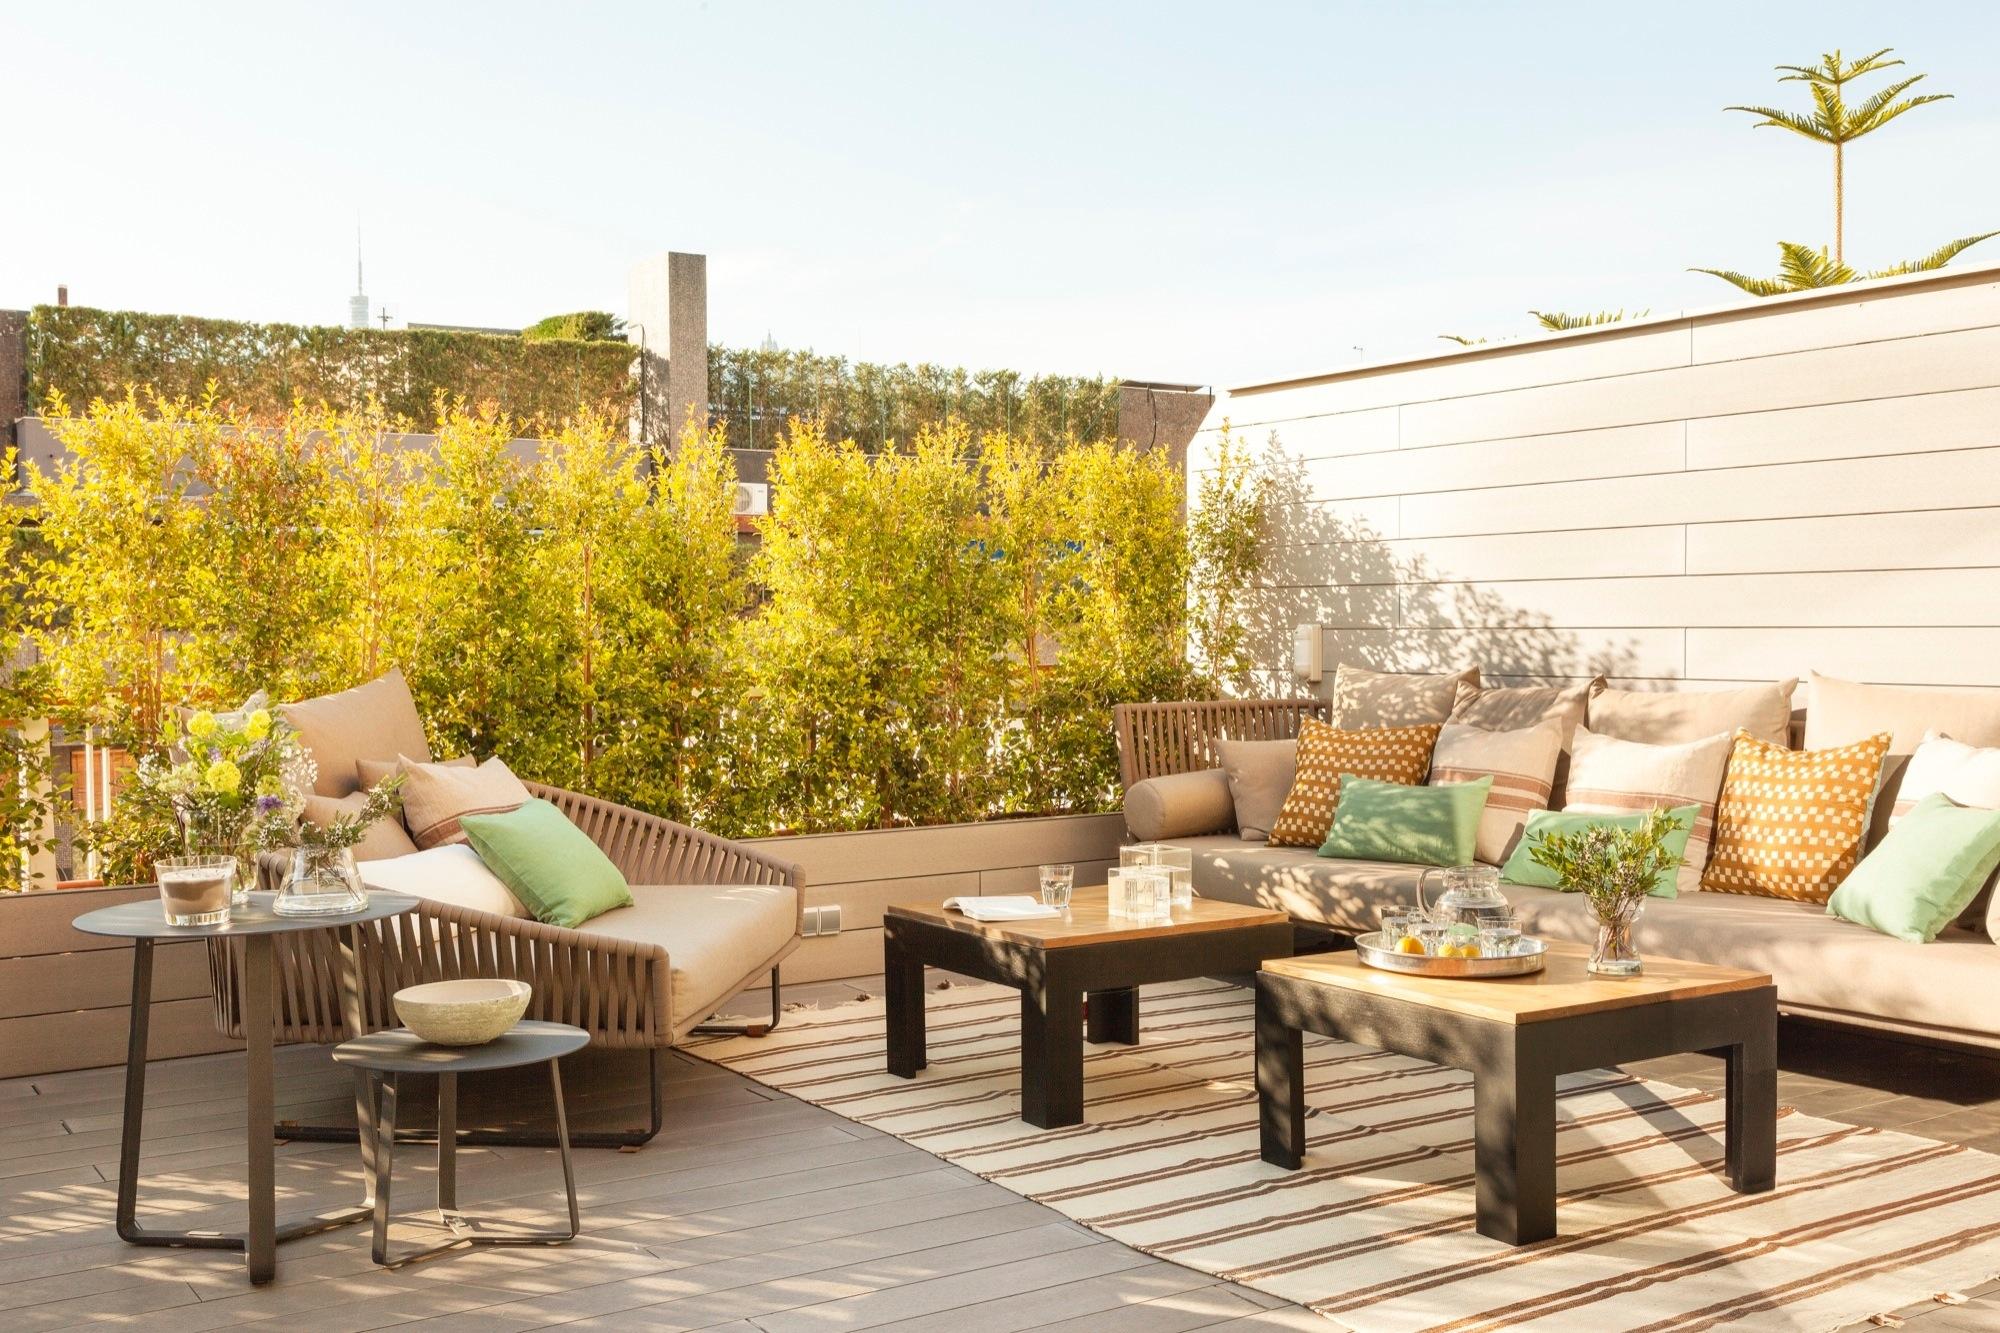 la terraza perfecta que conquist a los due os